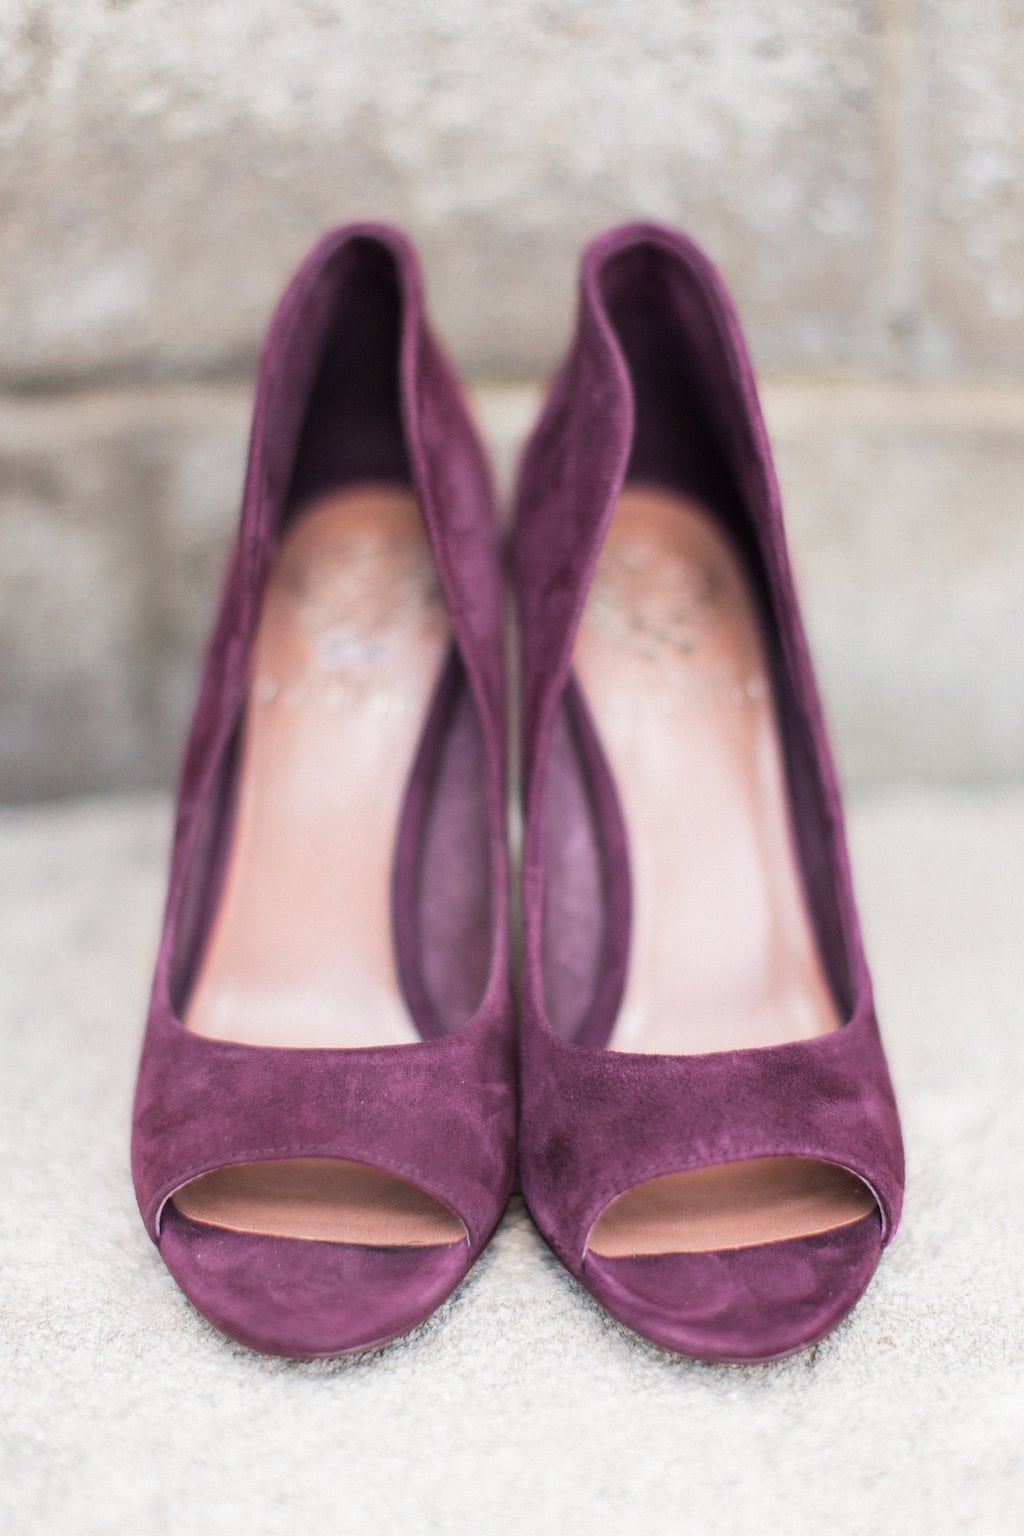 Purple velvet high heel wedding shoes